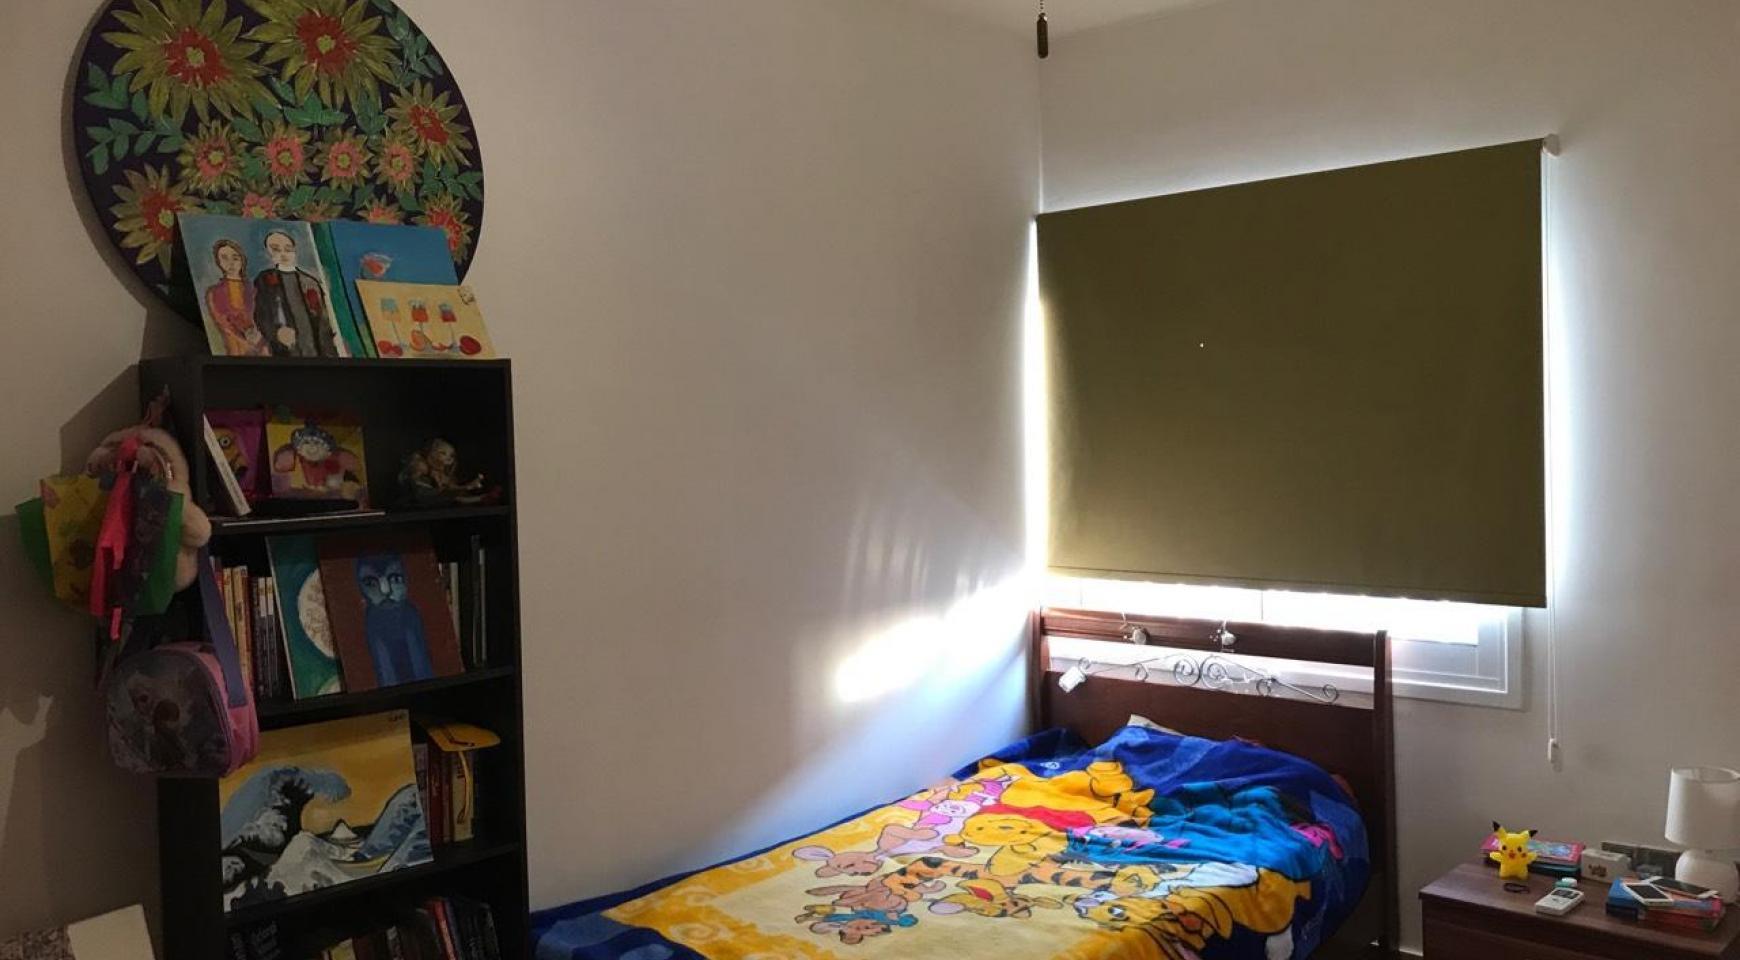 3 Bedroom Apartment in Molos Area near Limassol Marina - 11